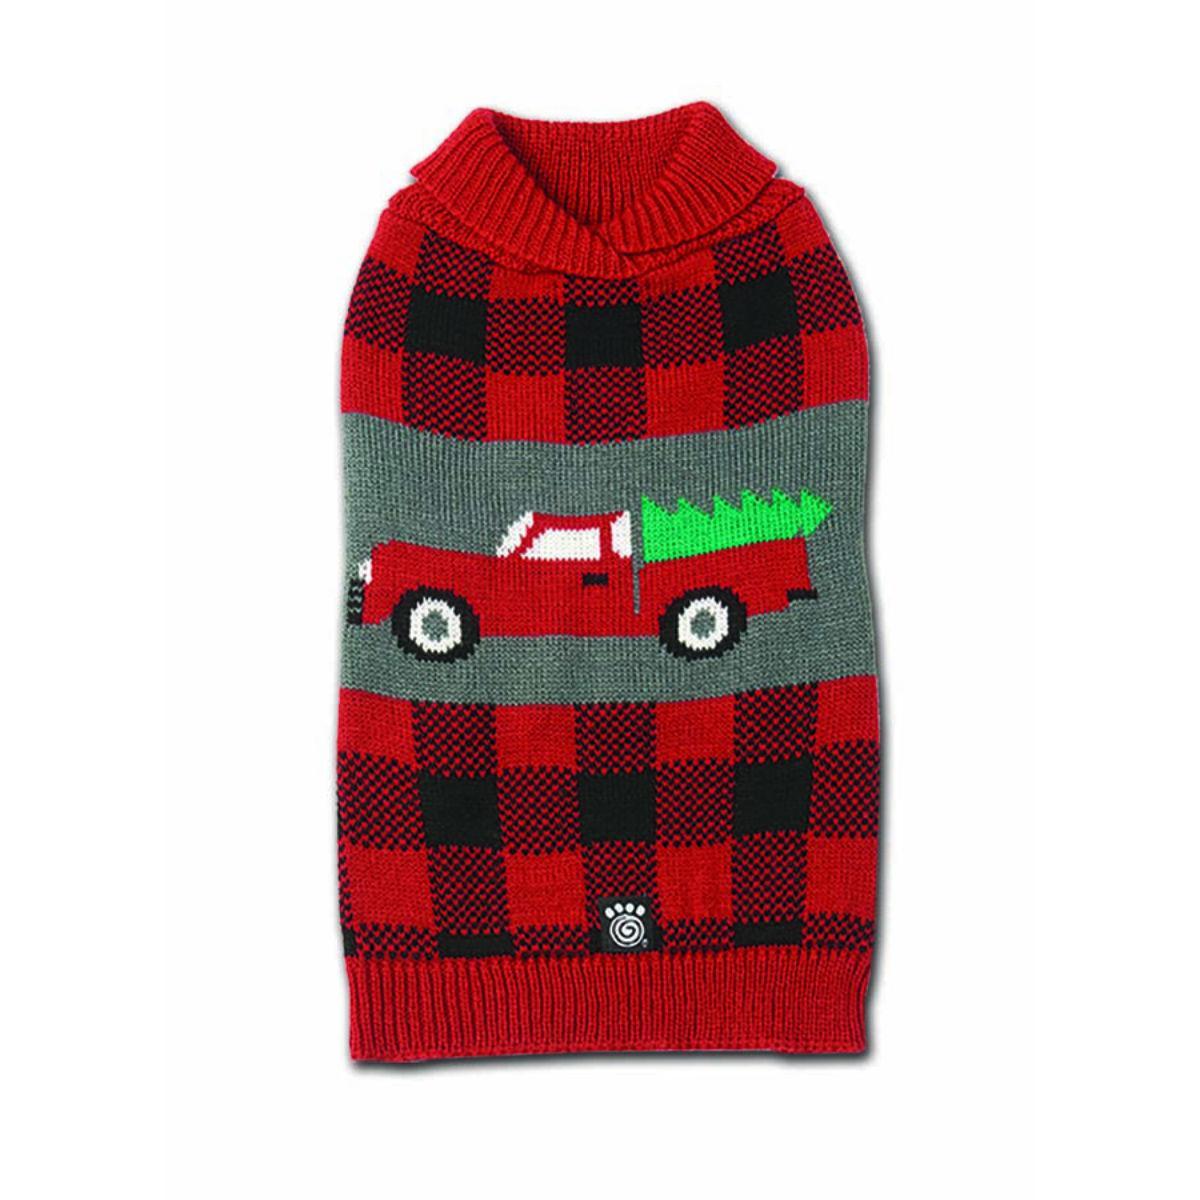 Jackson Novelty Dog Sweater - Tree & Truck